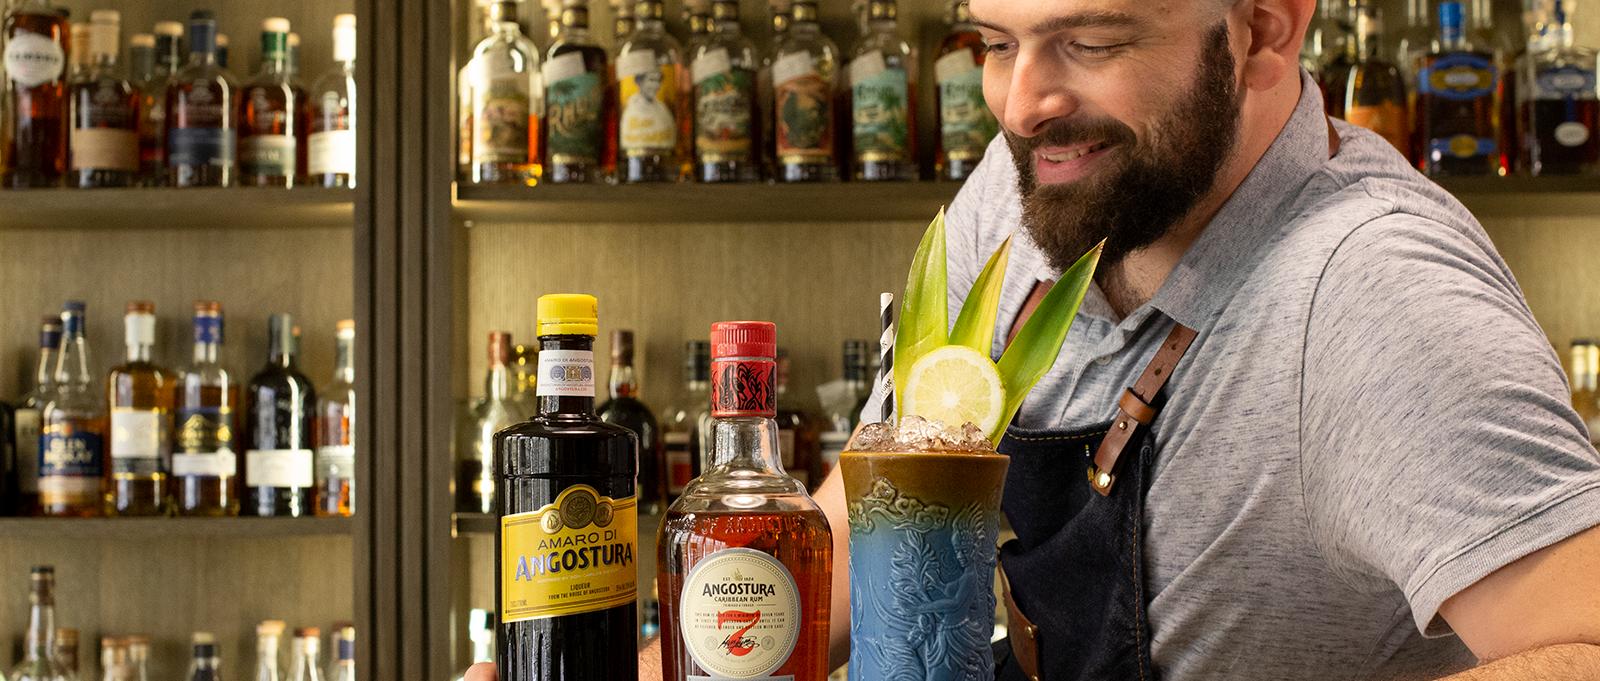 Pedro Martinez Ambassadeur Angostura Dugas Club Expert Cocktail d'été